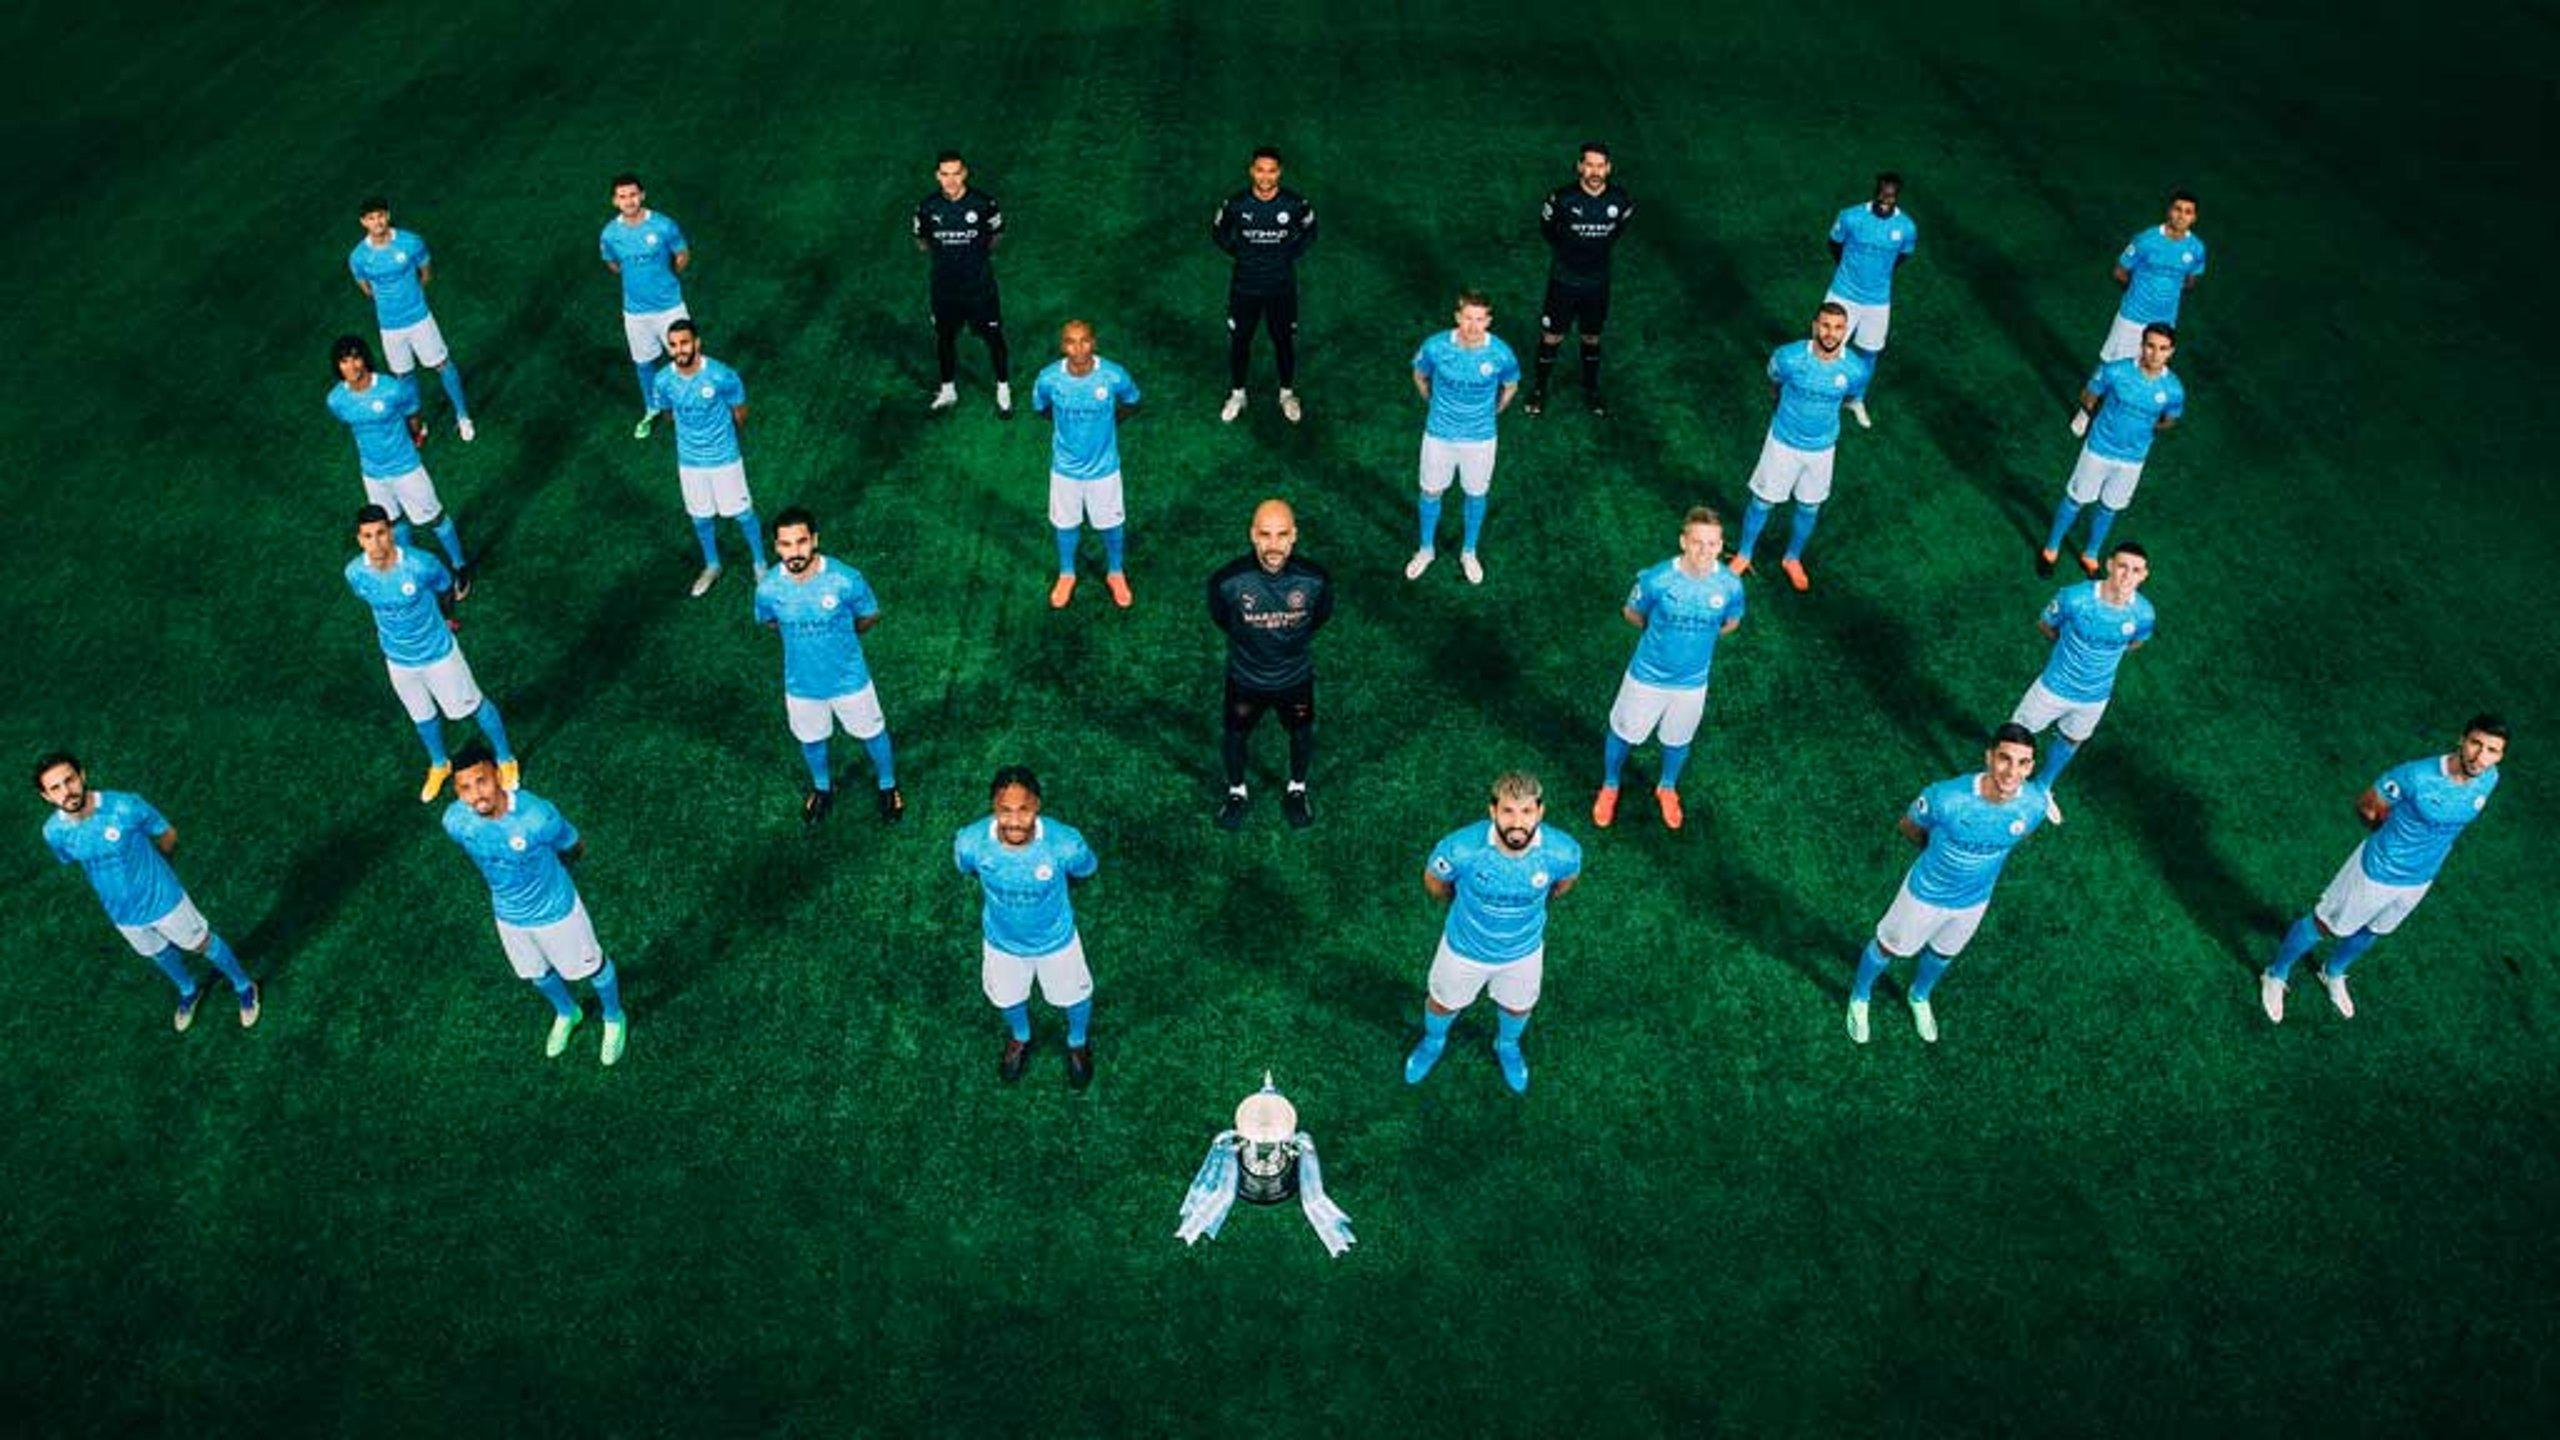 Gallery: City team photo 2020/21!